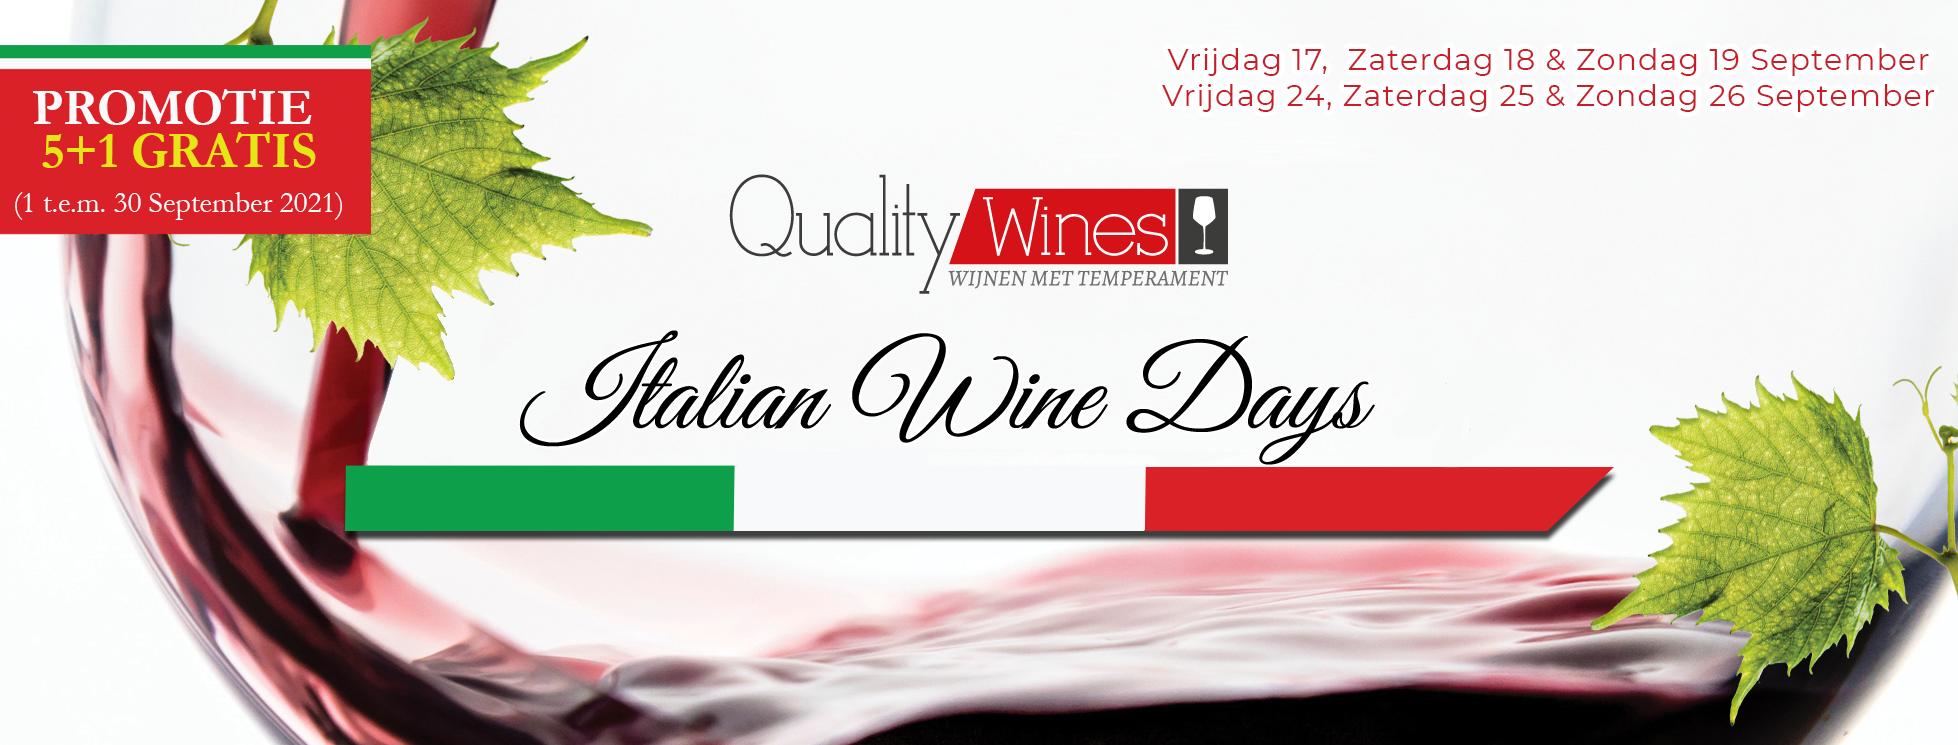 Italian Wine Days